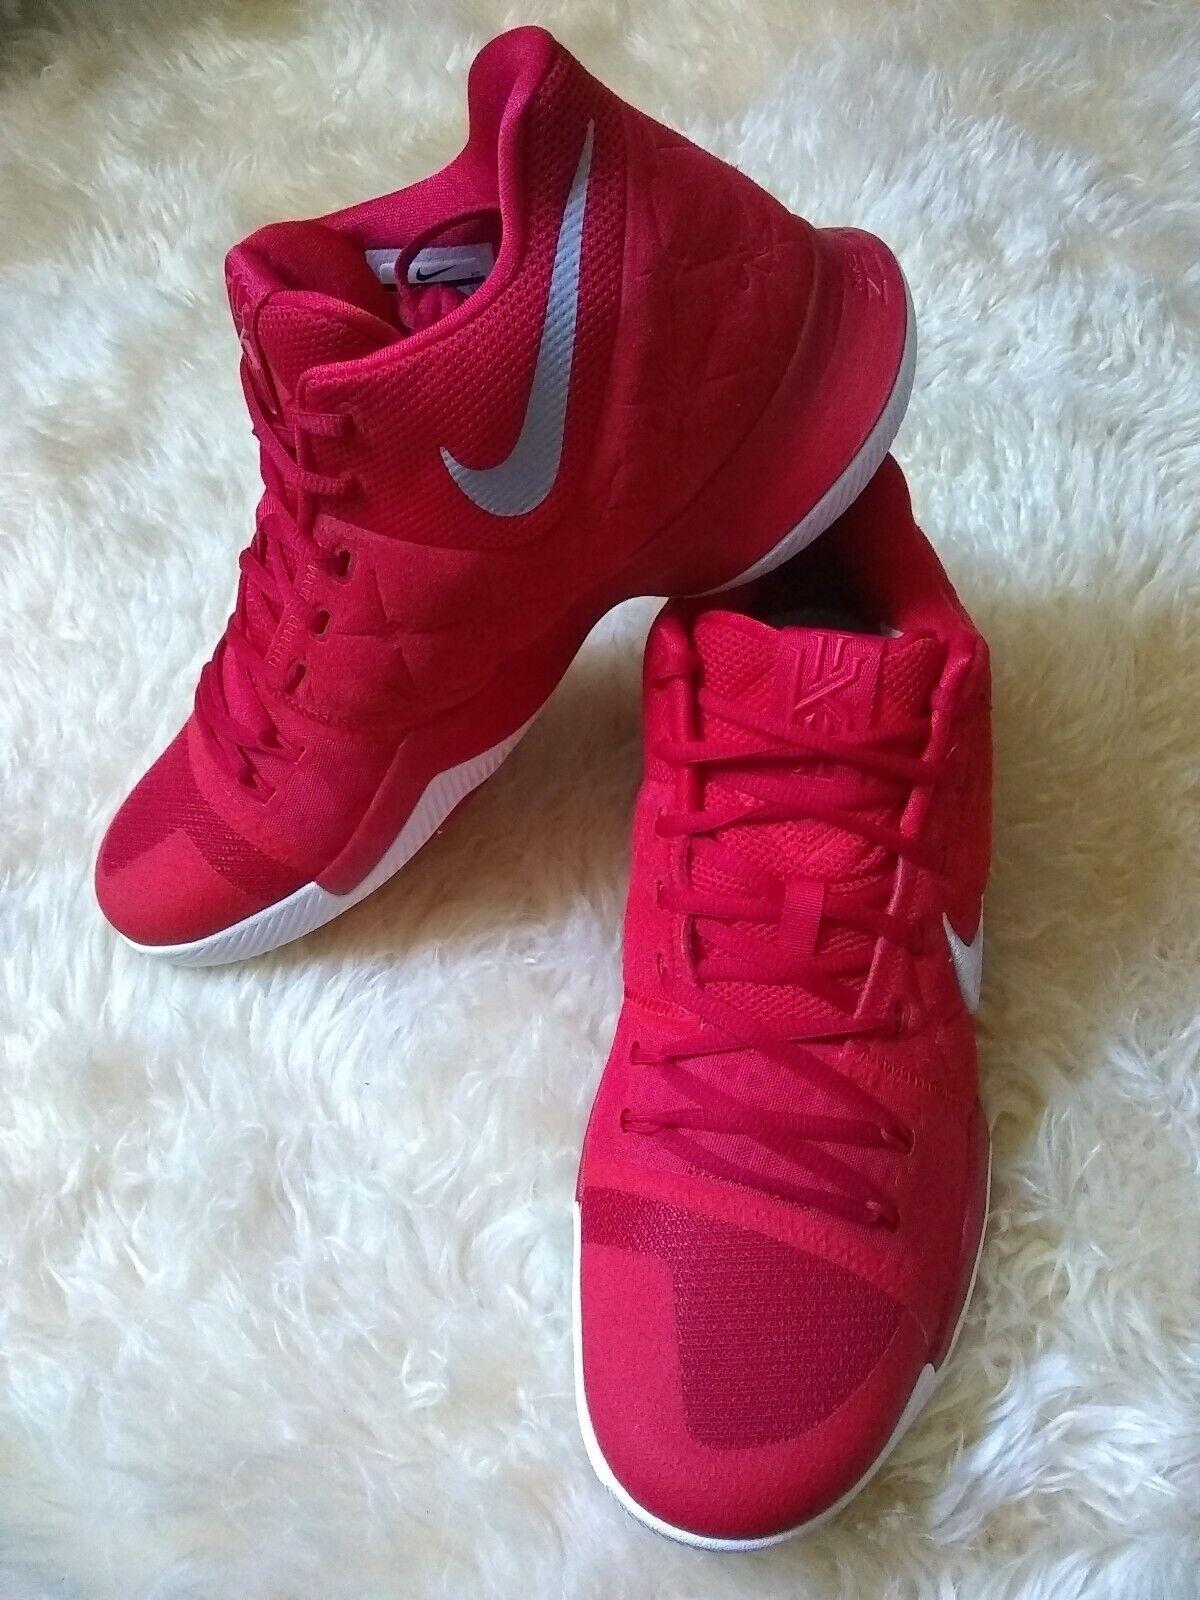 fff6d9641911bd Nike Kyrie 3 University Red Suede 852395 601 Basketball Basketball  Basketball Men s Sneakers Size 13 8de2c7